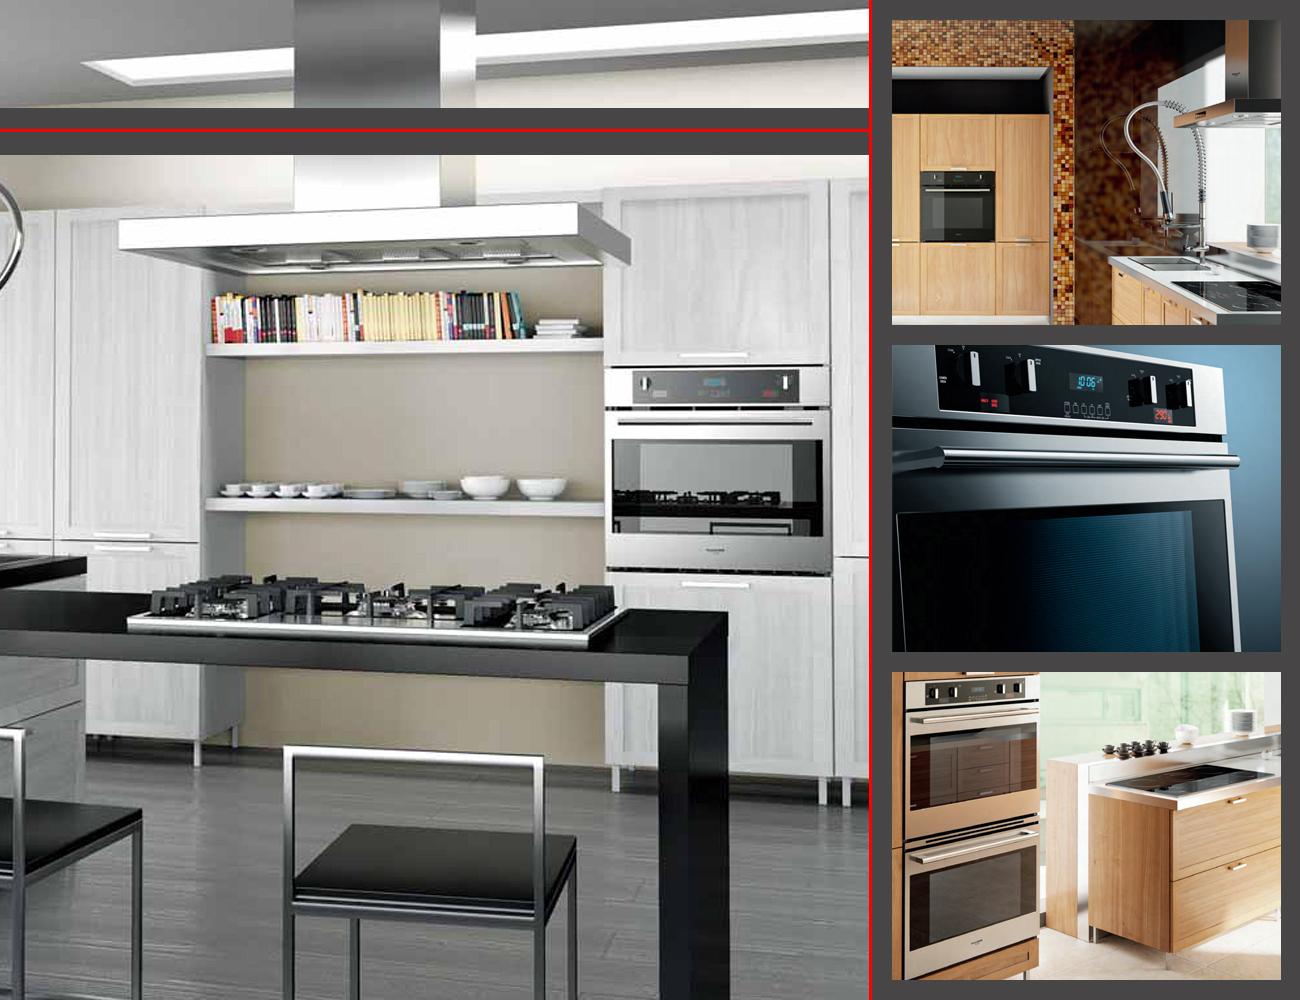 Fulgor Milano 600 Series Appliances Connection